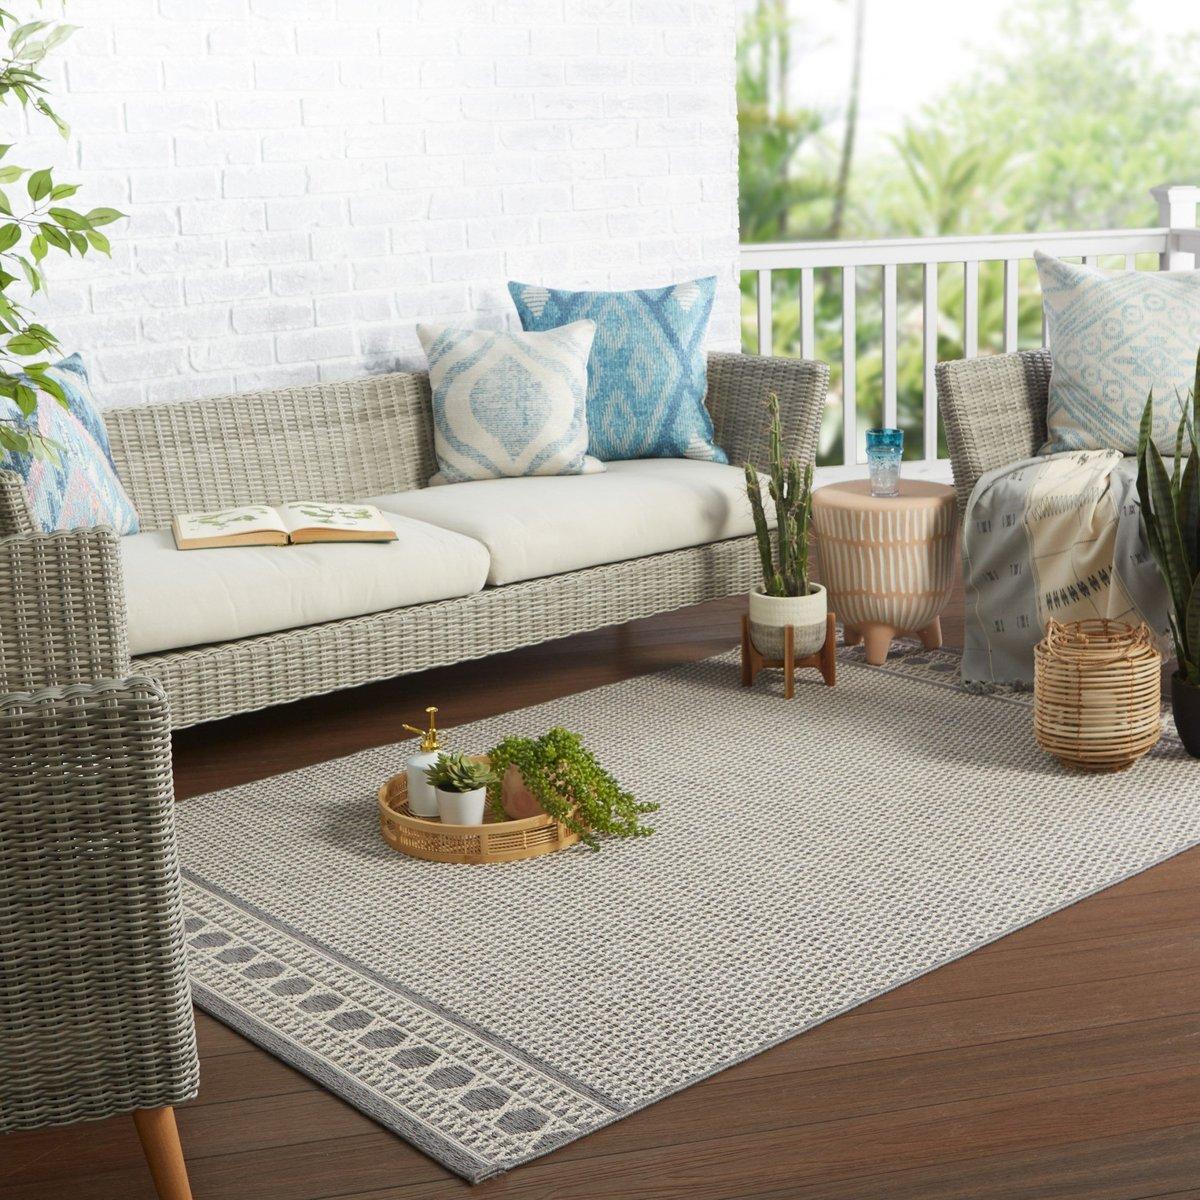 Gentle Oasis Outdoor Decor Ideas